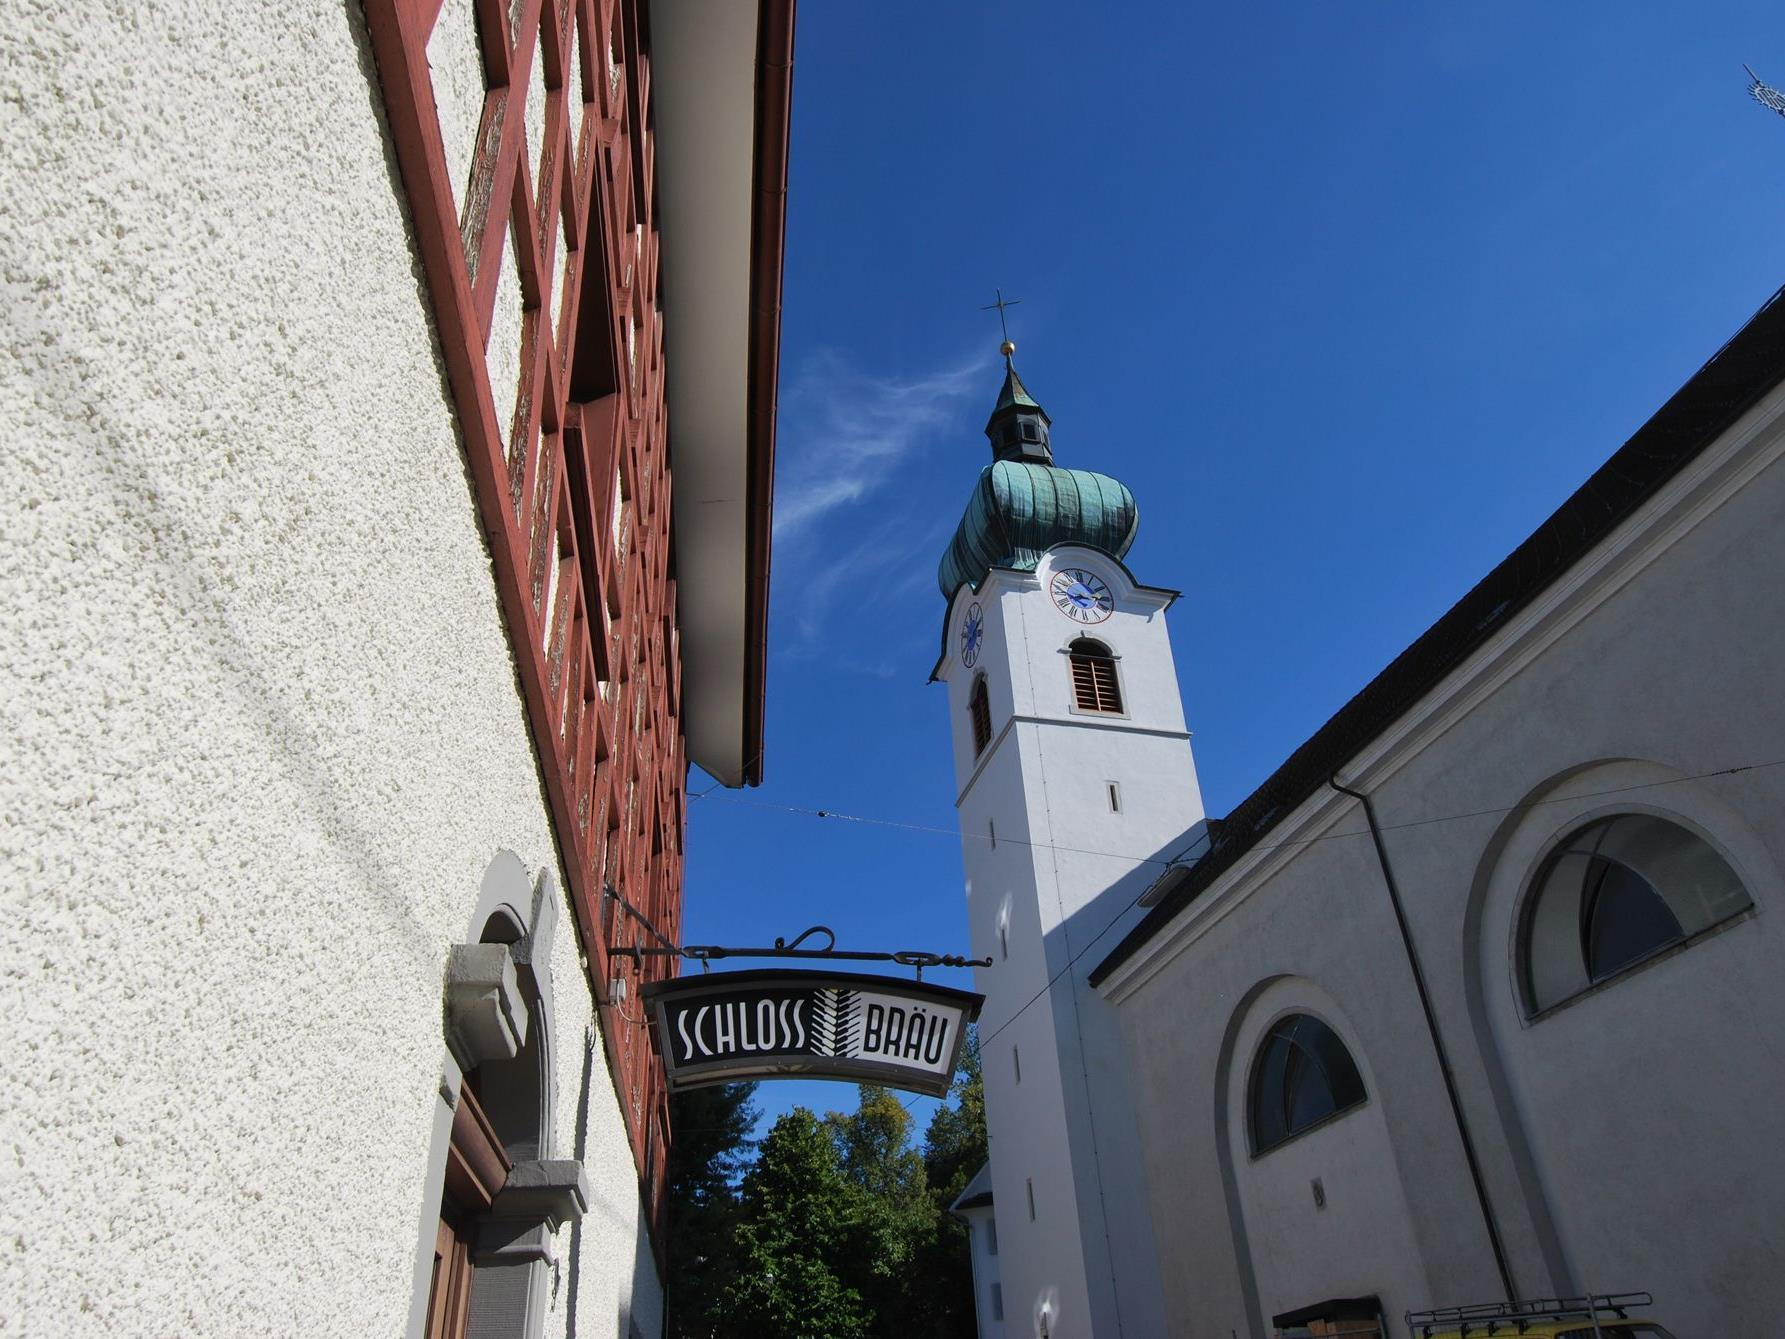 Das Schlossbräu in Dornbirn ist endgültig Geschichte